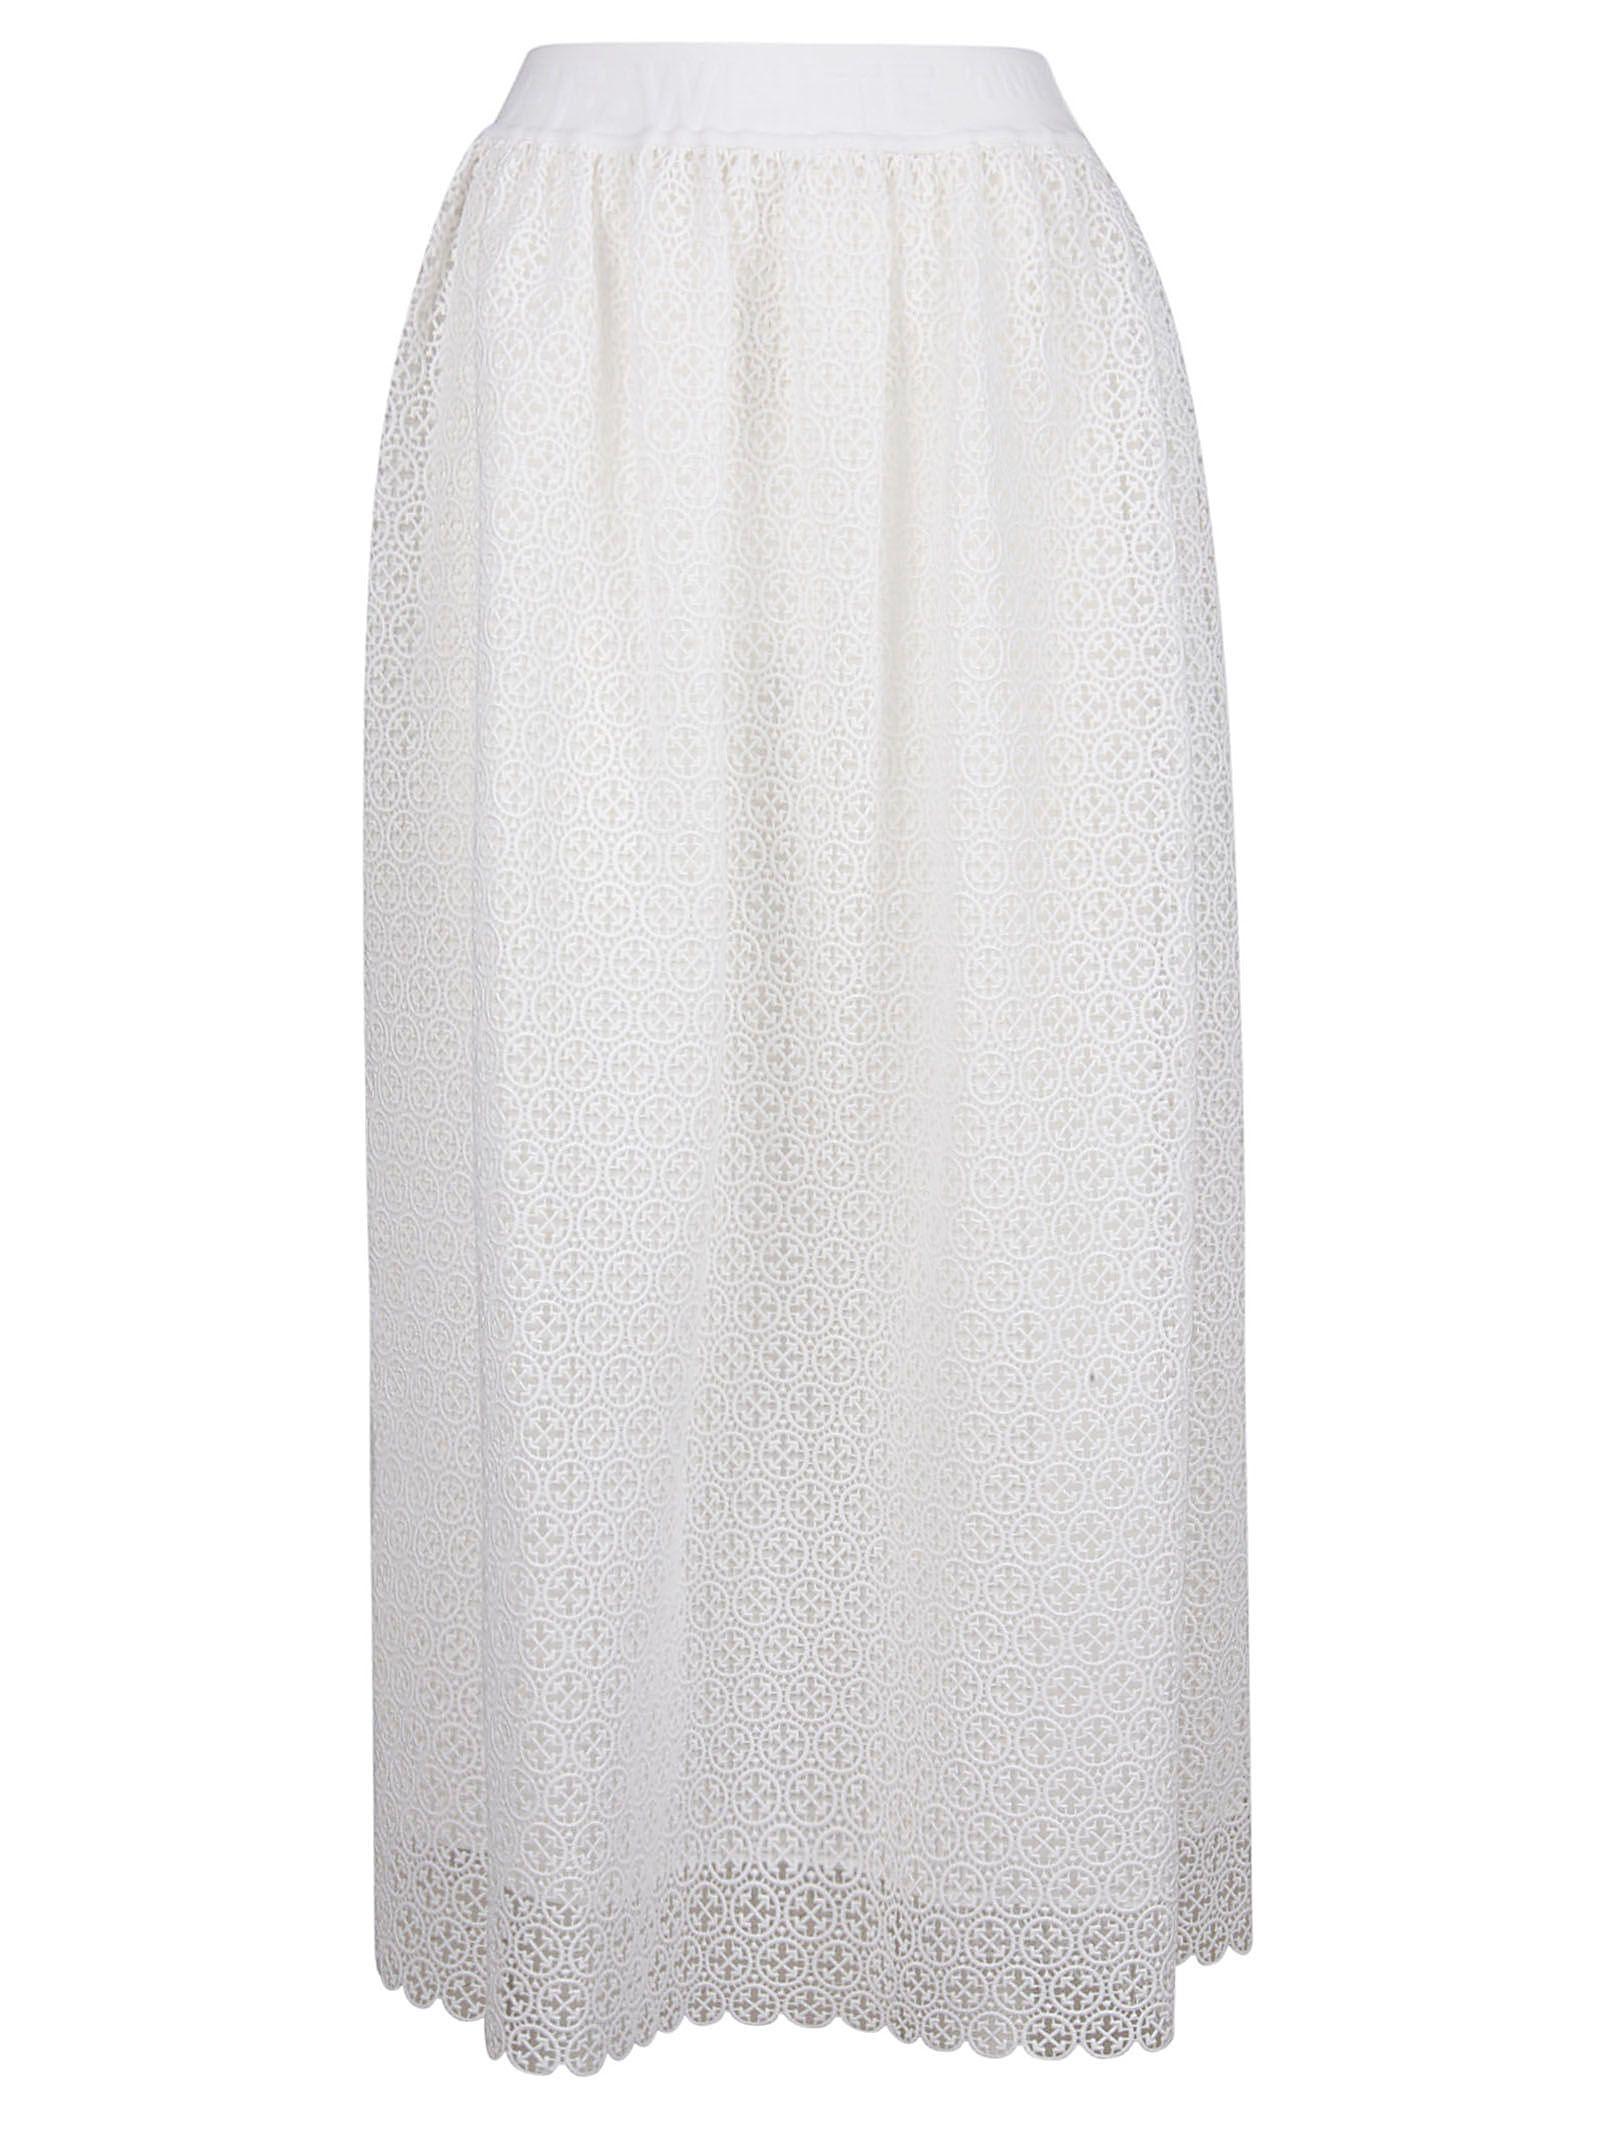 dd631c6897 Off-White Off-white A-line Skirt - White No Color - 10917645 | italist